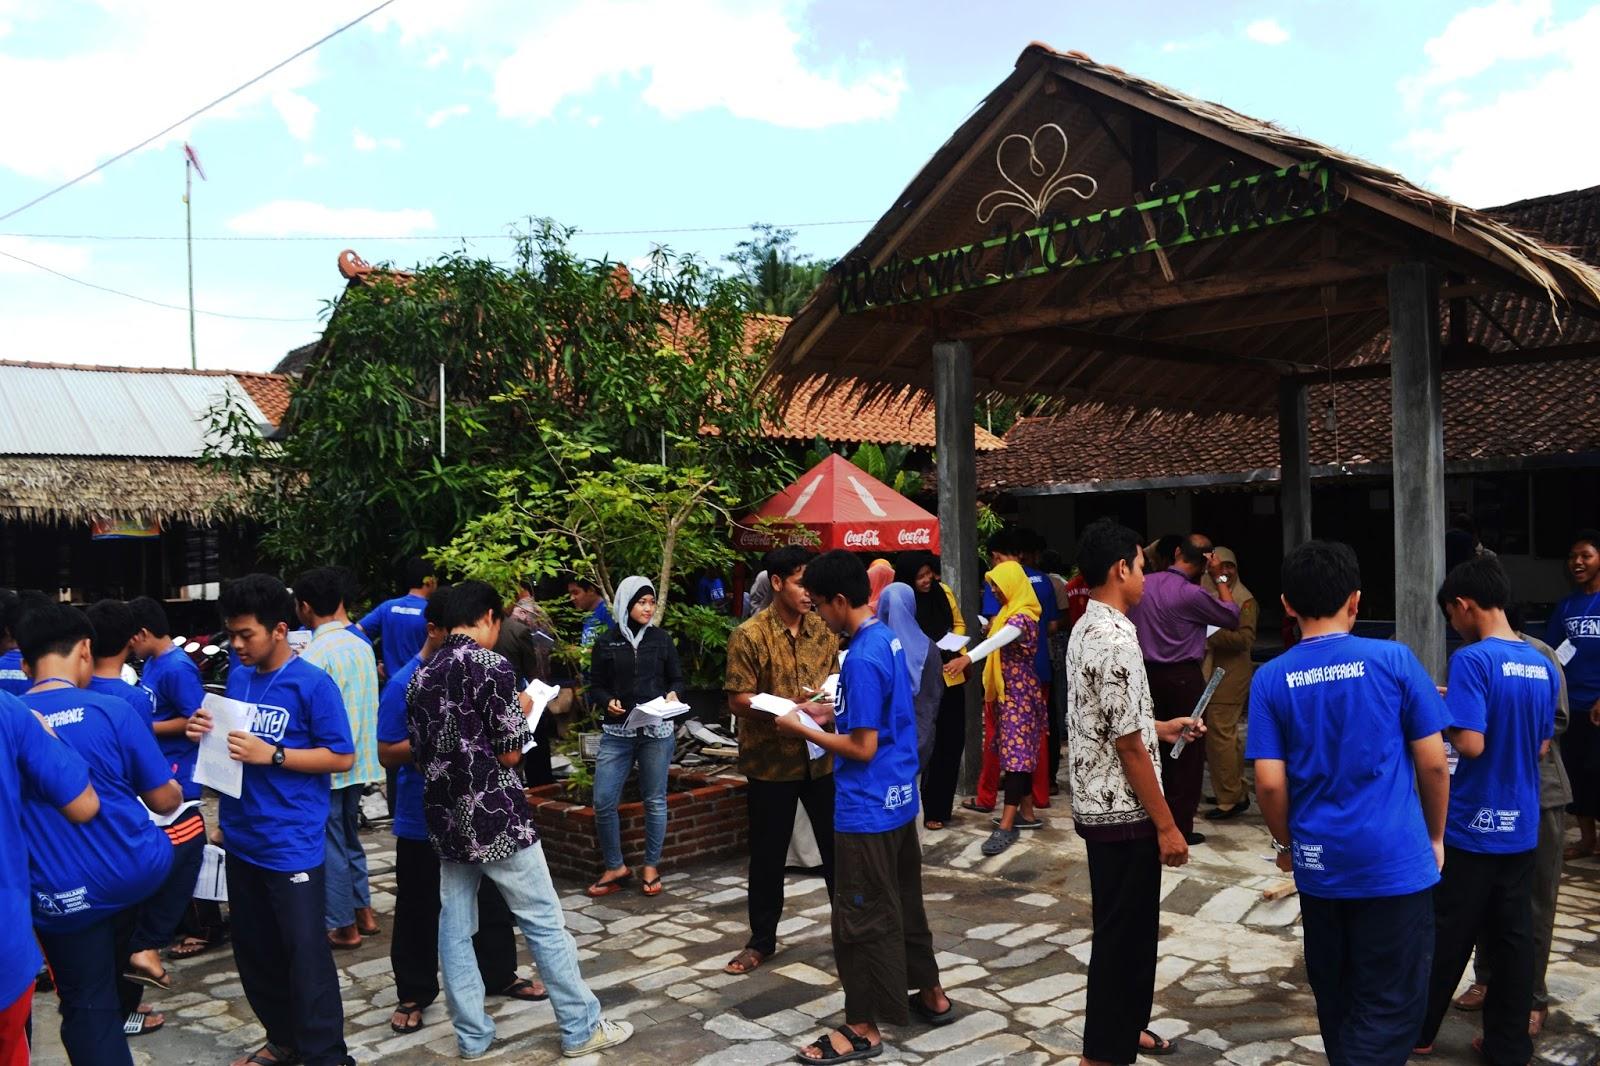 Apa itu Desa Bahasa Borobudur? - Desa Bahasa